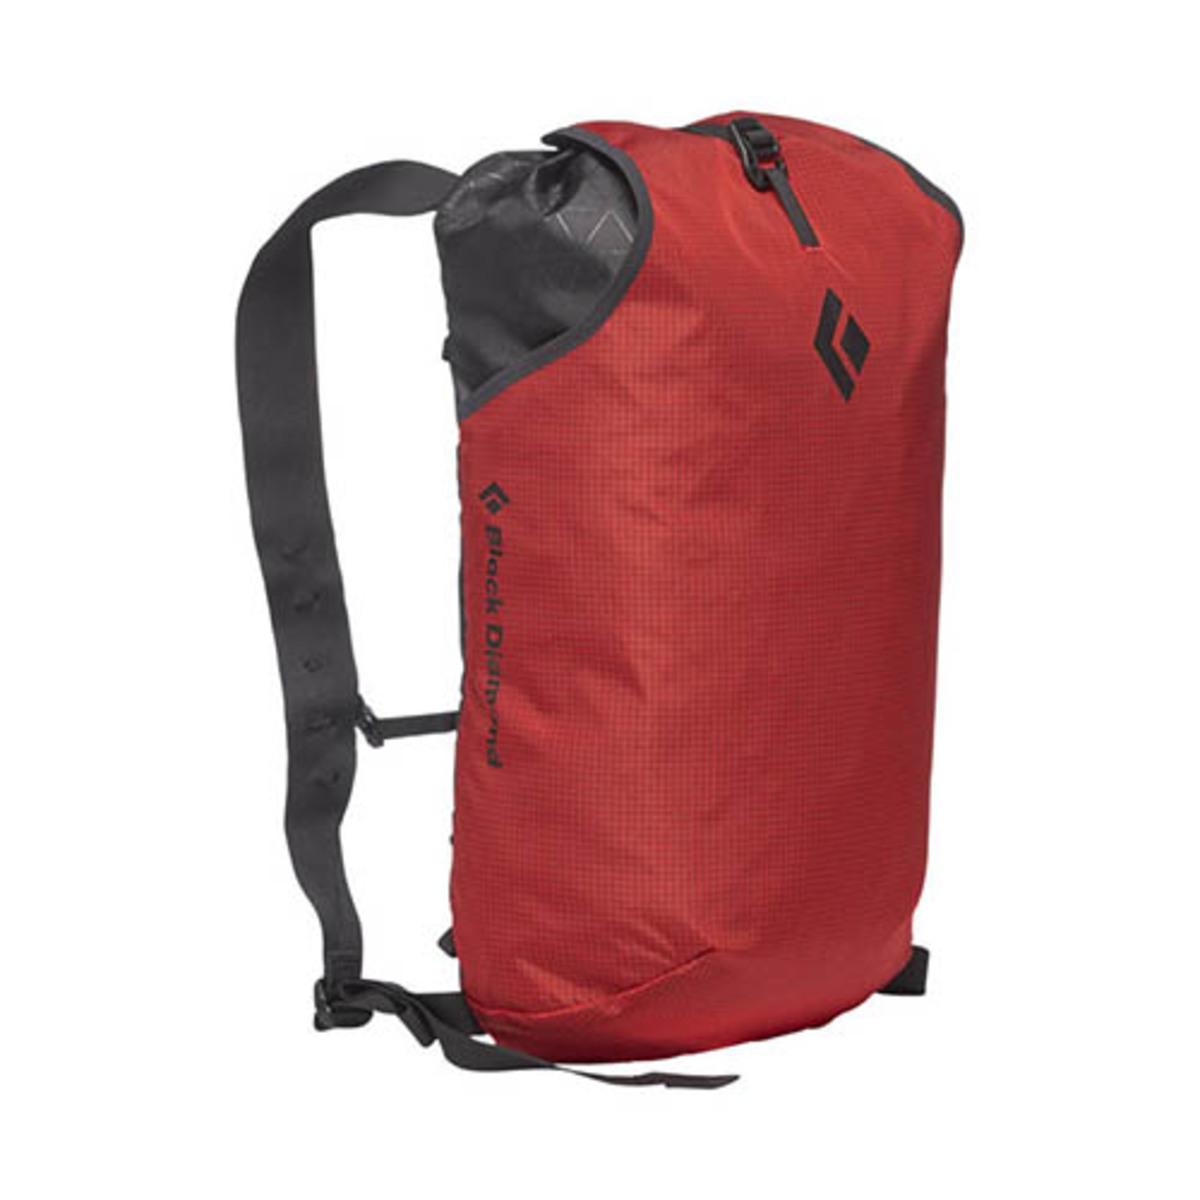 摺疊背囊 Trail Blitz 12 Backpack-Hyper Red-681222